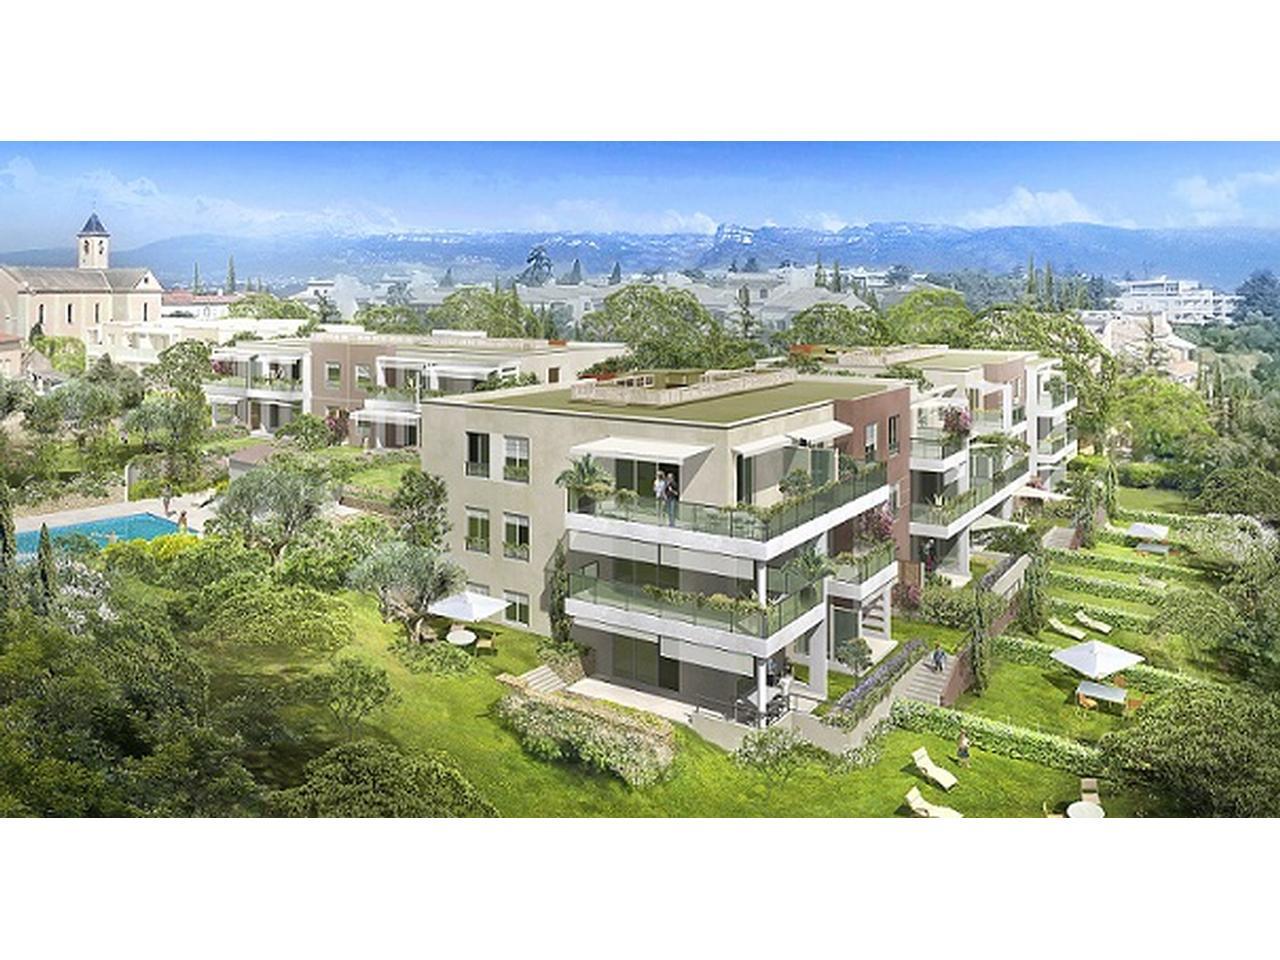 Immobilier nice vue mer appartement nice 3 pieces dernier - Livraison nice ouest ...